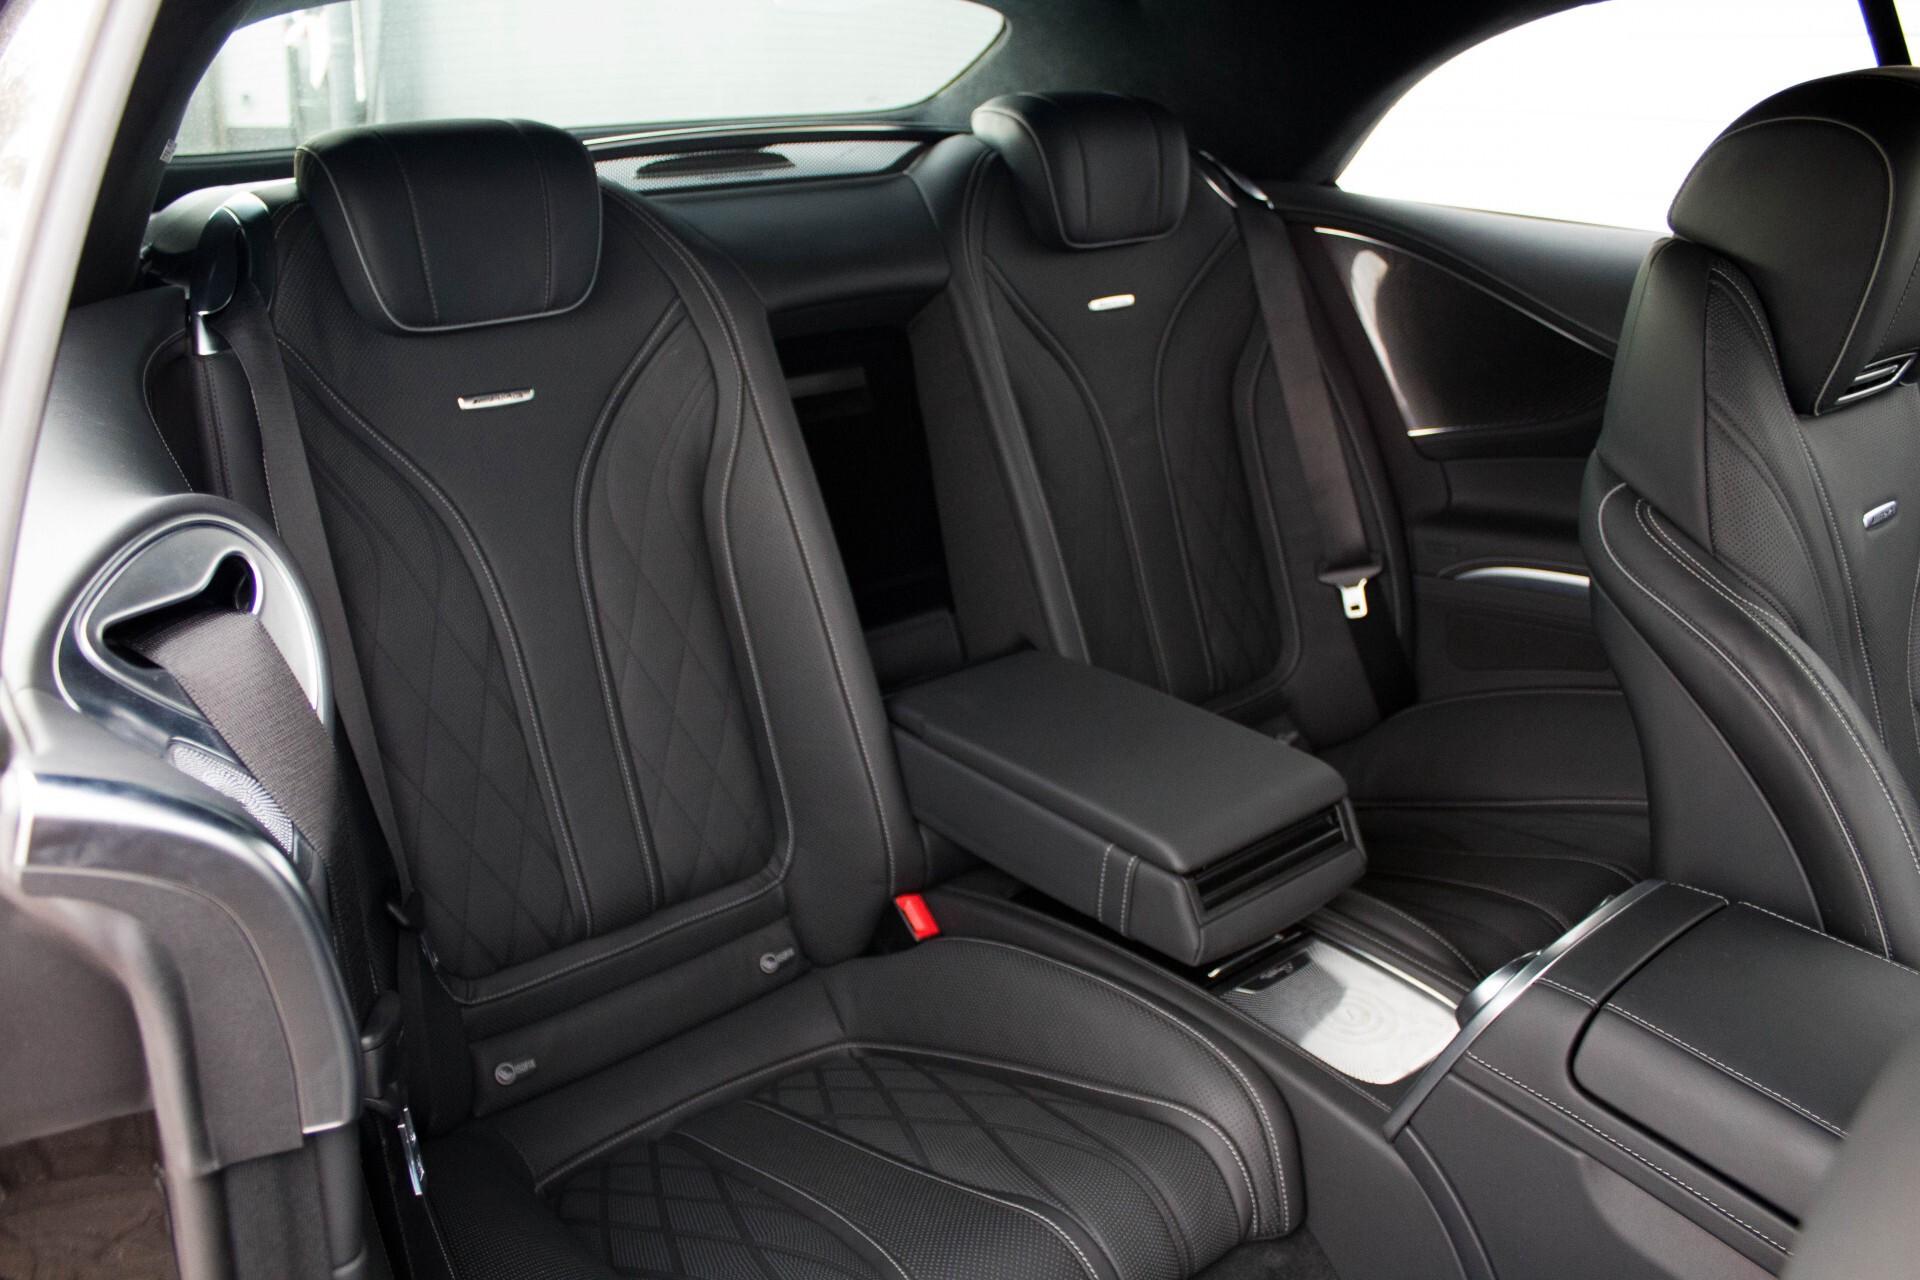 Mercedes-Benz S-Klasse Cabrio 63 AMG 4-M Ceramic/Designo/Carbon/Burmester High End Aut Foto 7